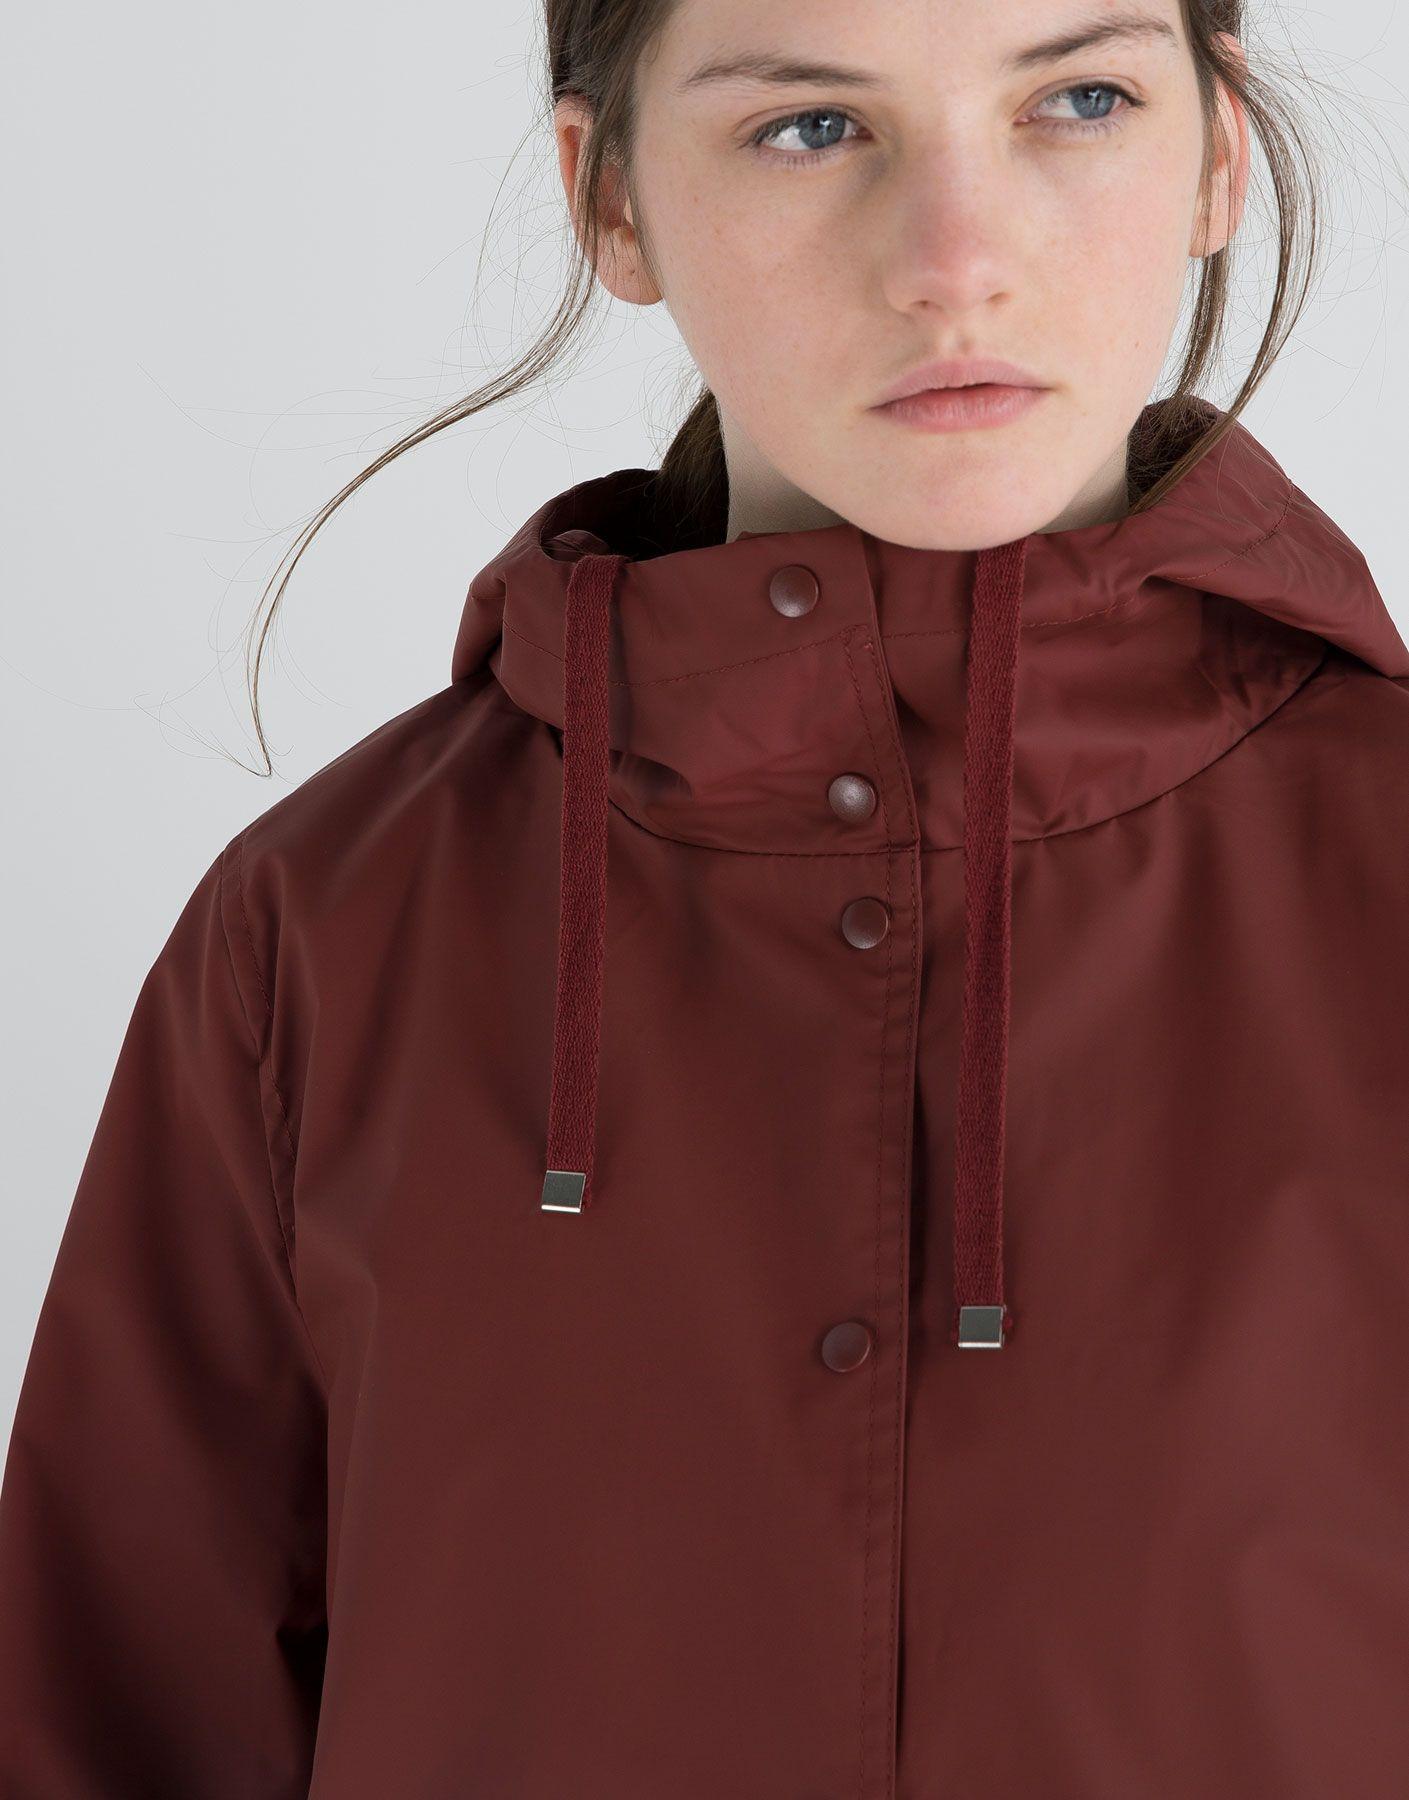 d0986d48c8eb7b Pin by Nina Bepunkt on chlothes   Rain wear, Jackets, Coat